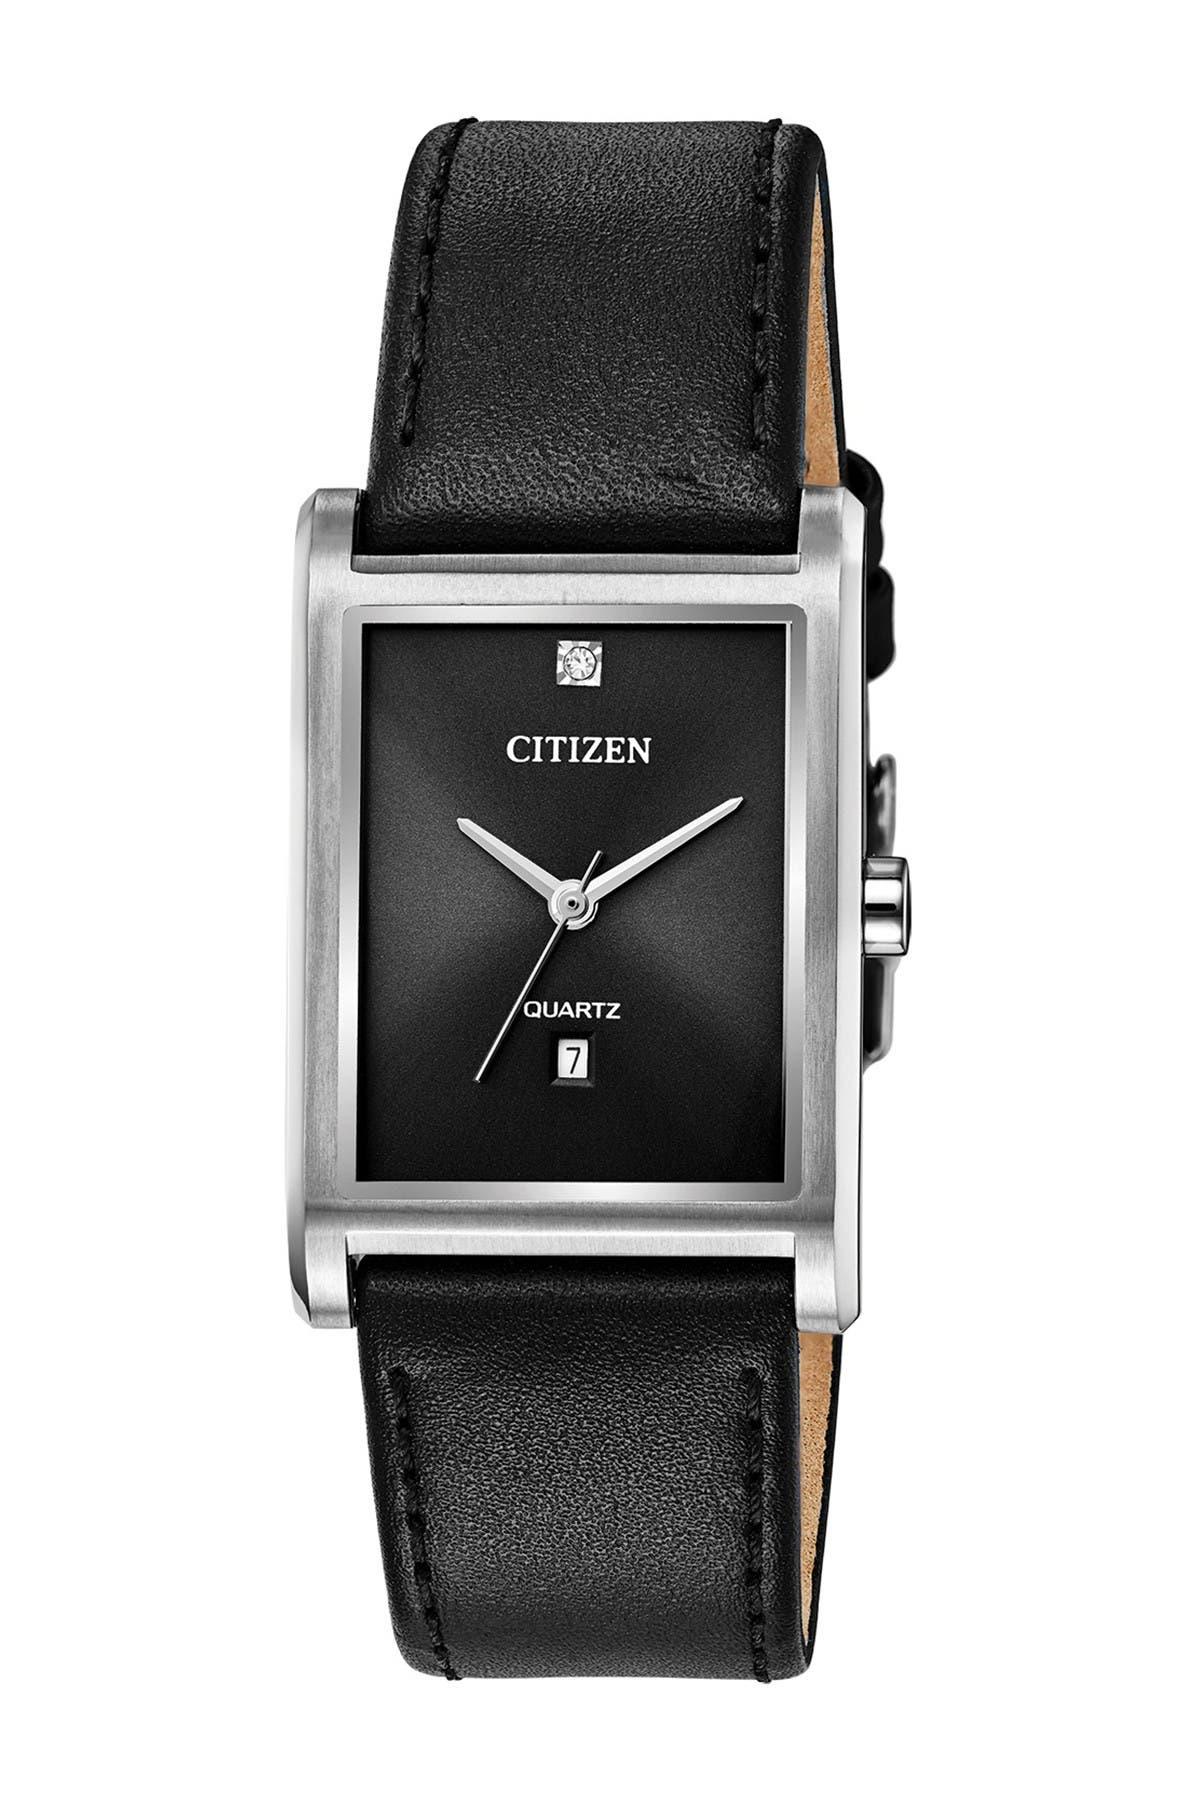 Image of Citizen Men's Black Leather Strap Watch, 25.5mm